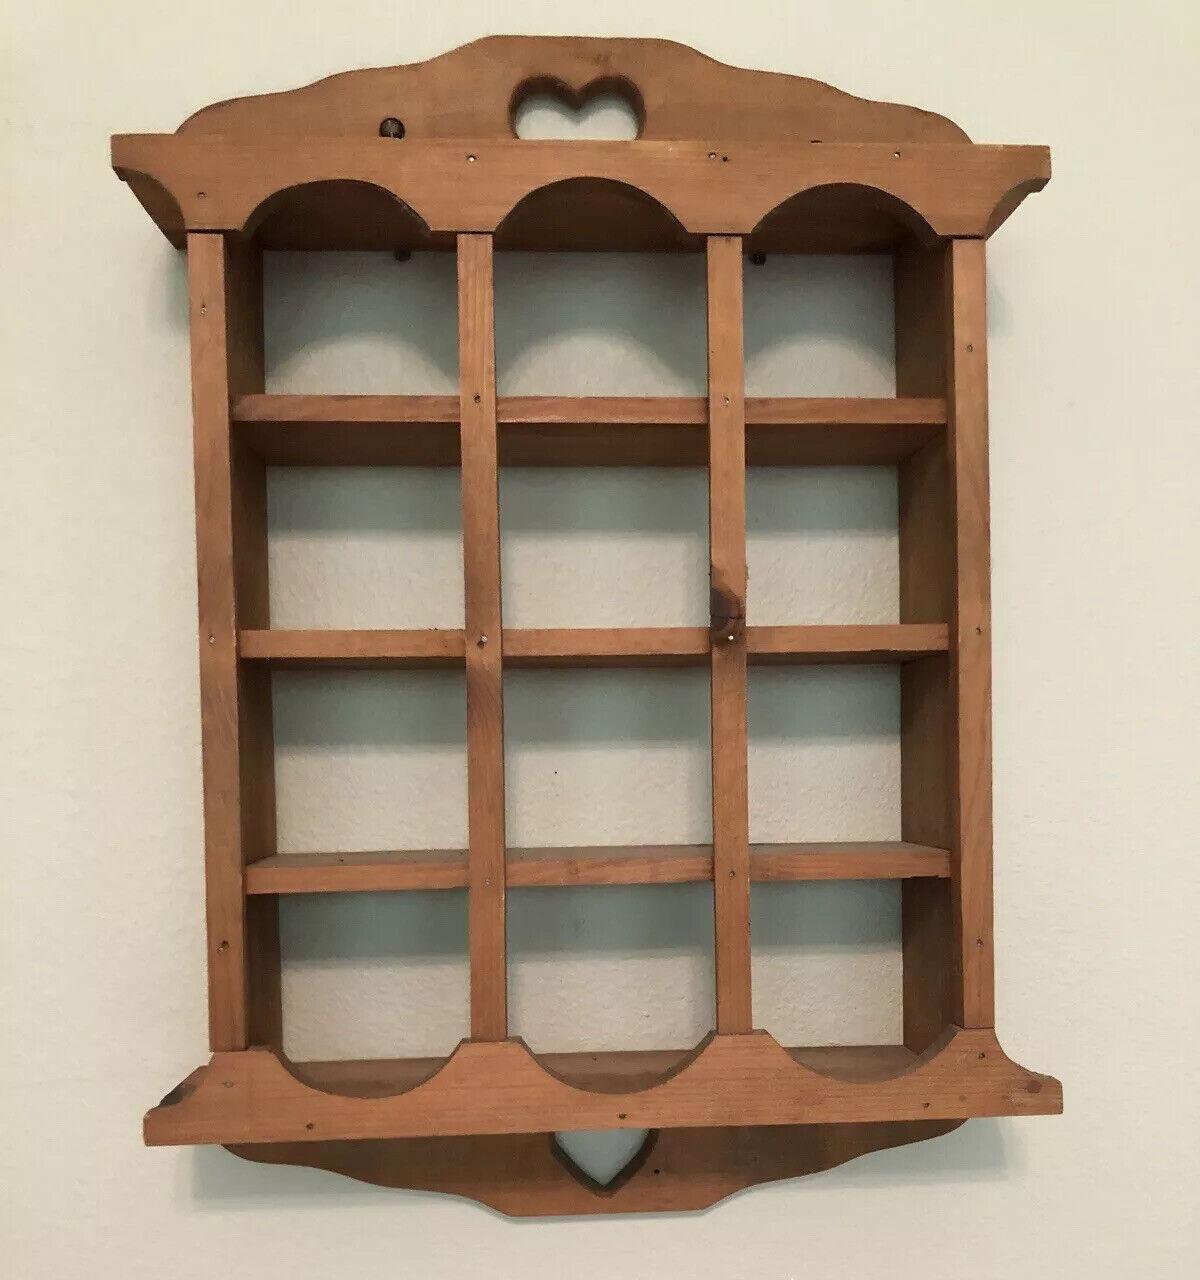 Knick Knack Wall Display Shelf 3 Tier